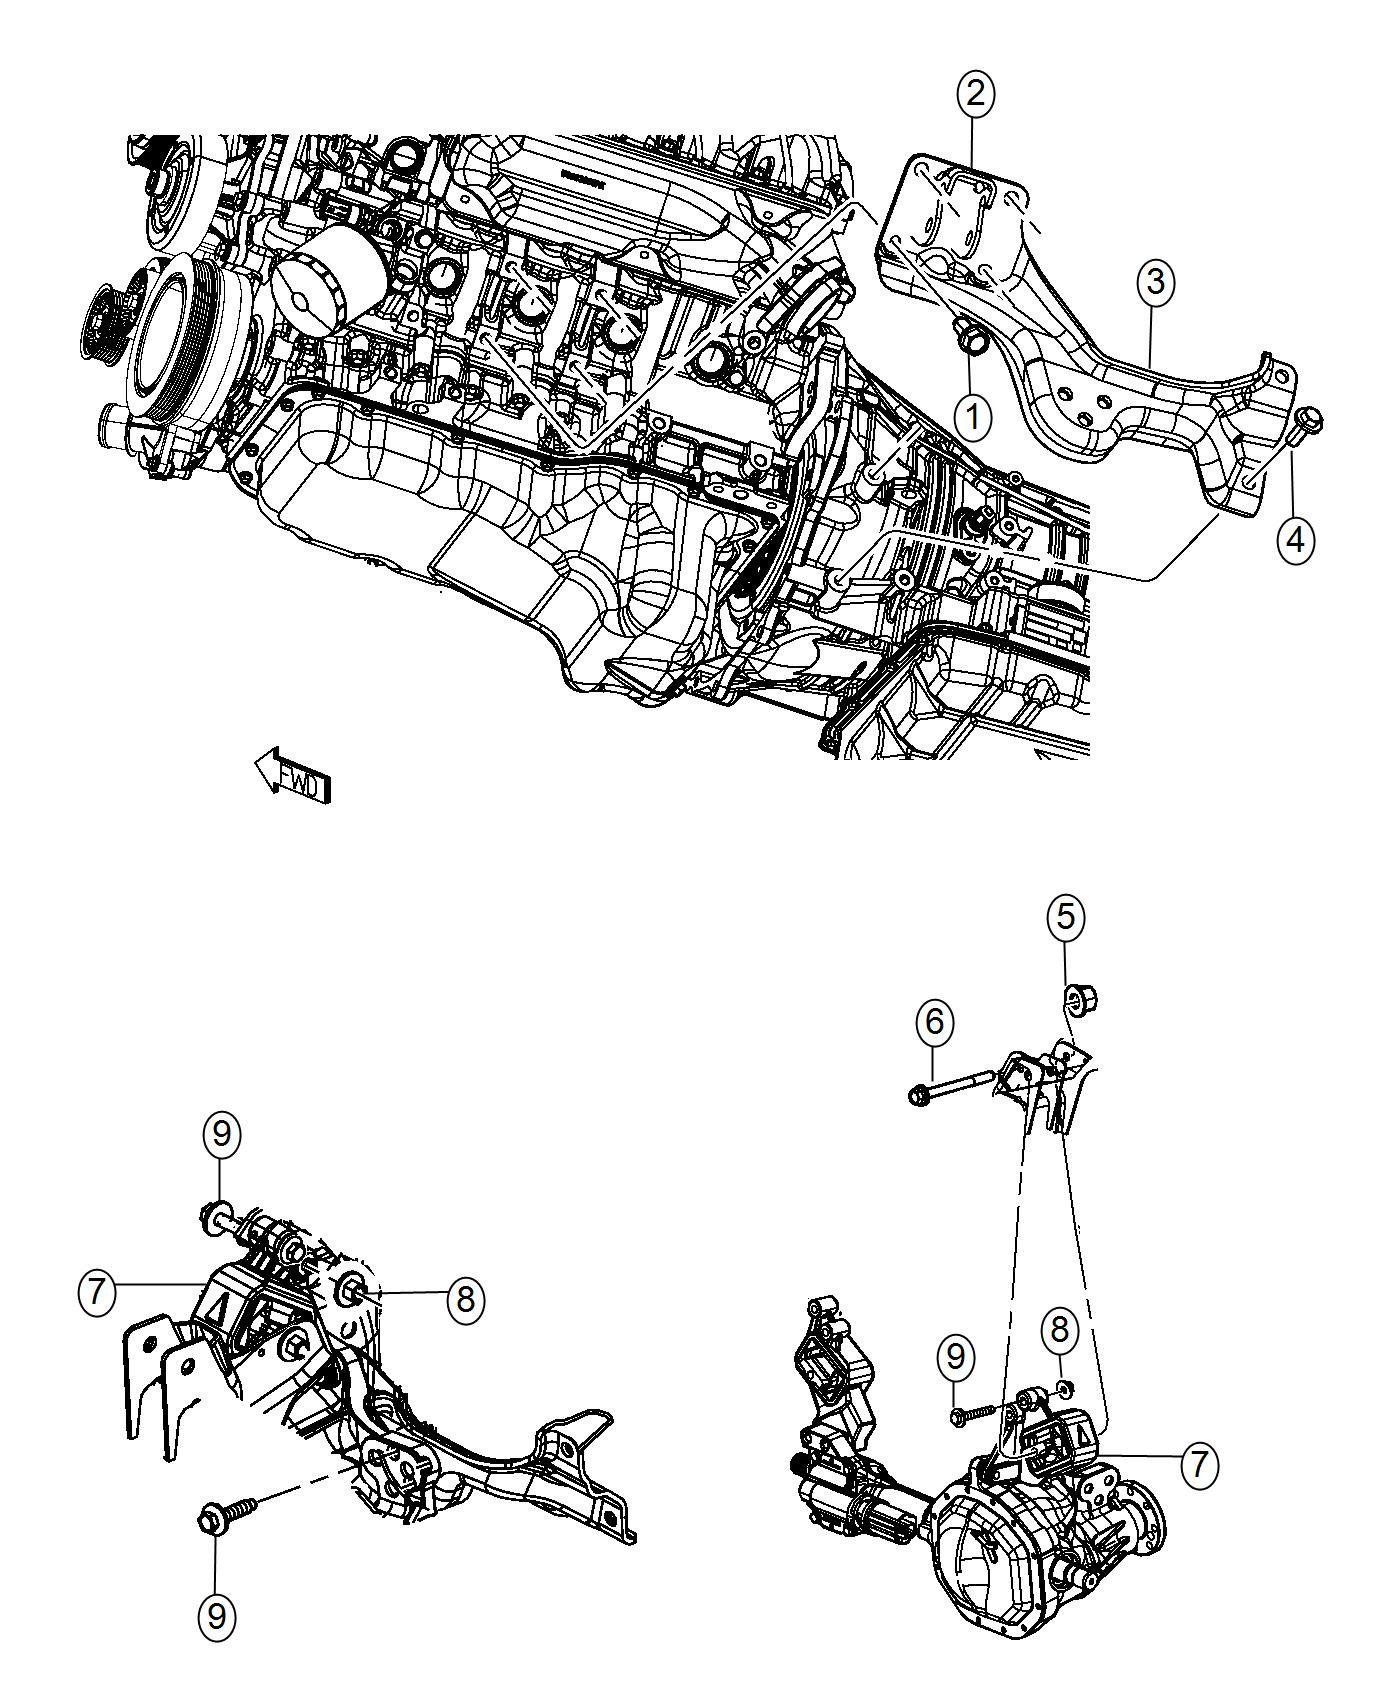 Ram Insulator Engine Mount Left Side Mounting